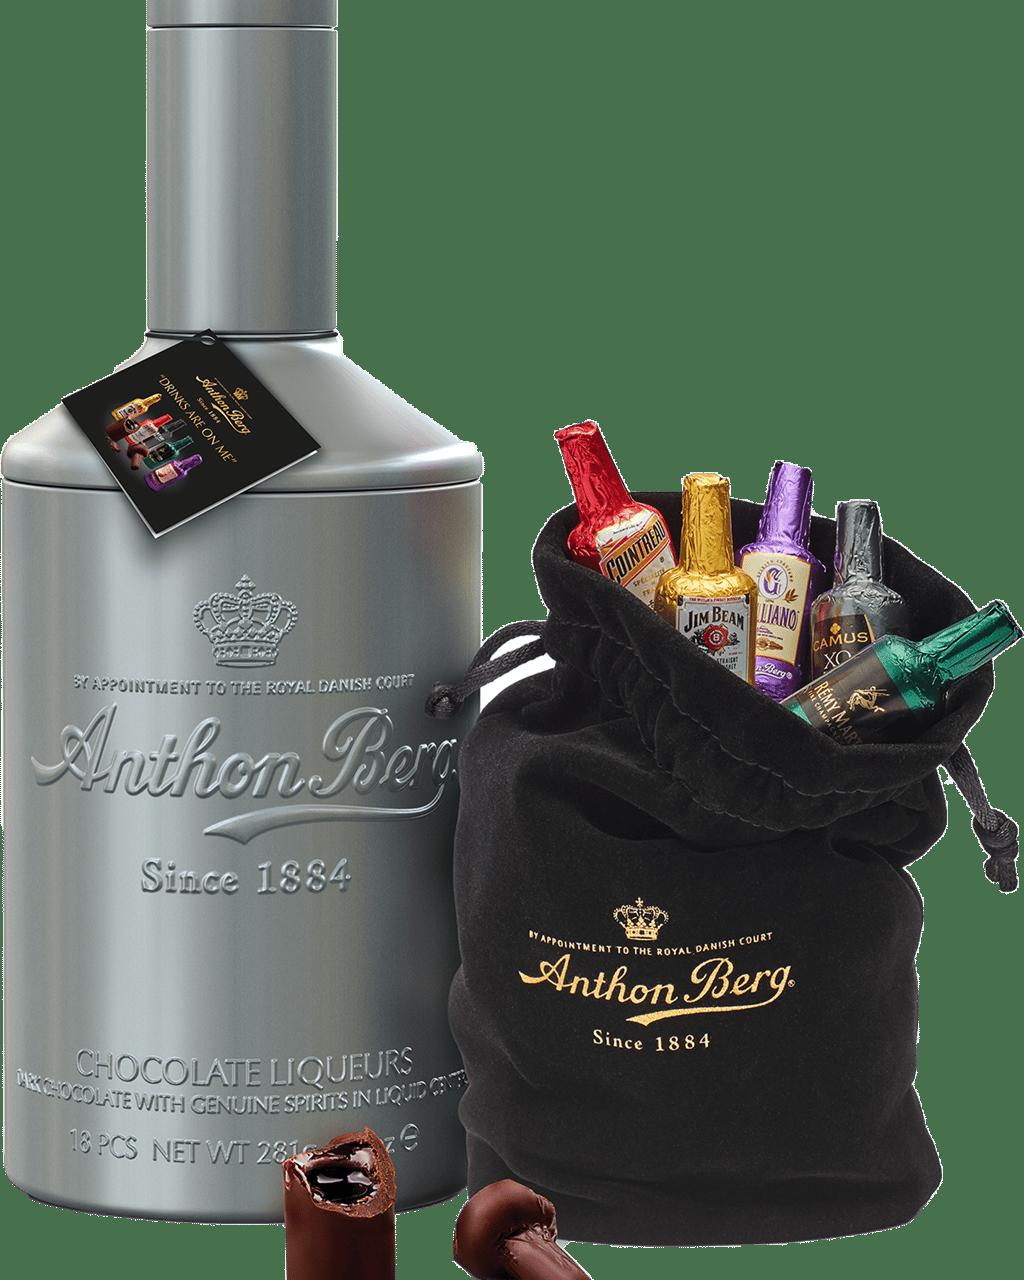 Buy Anthon Berg 18pcs Chocolate Liqueurs Dan Murphys